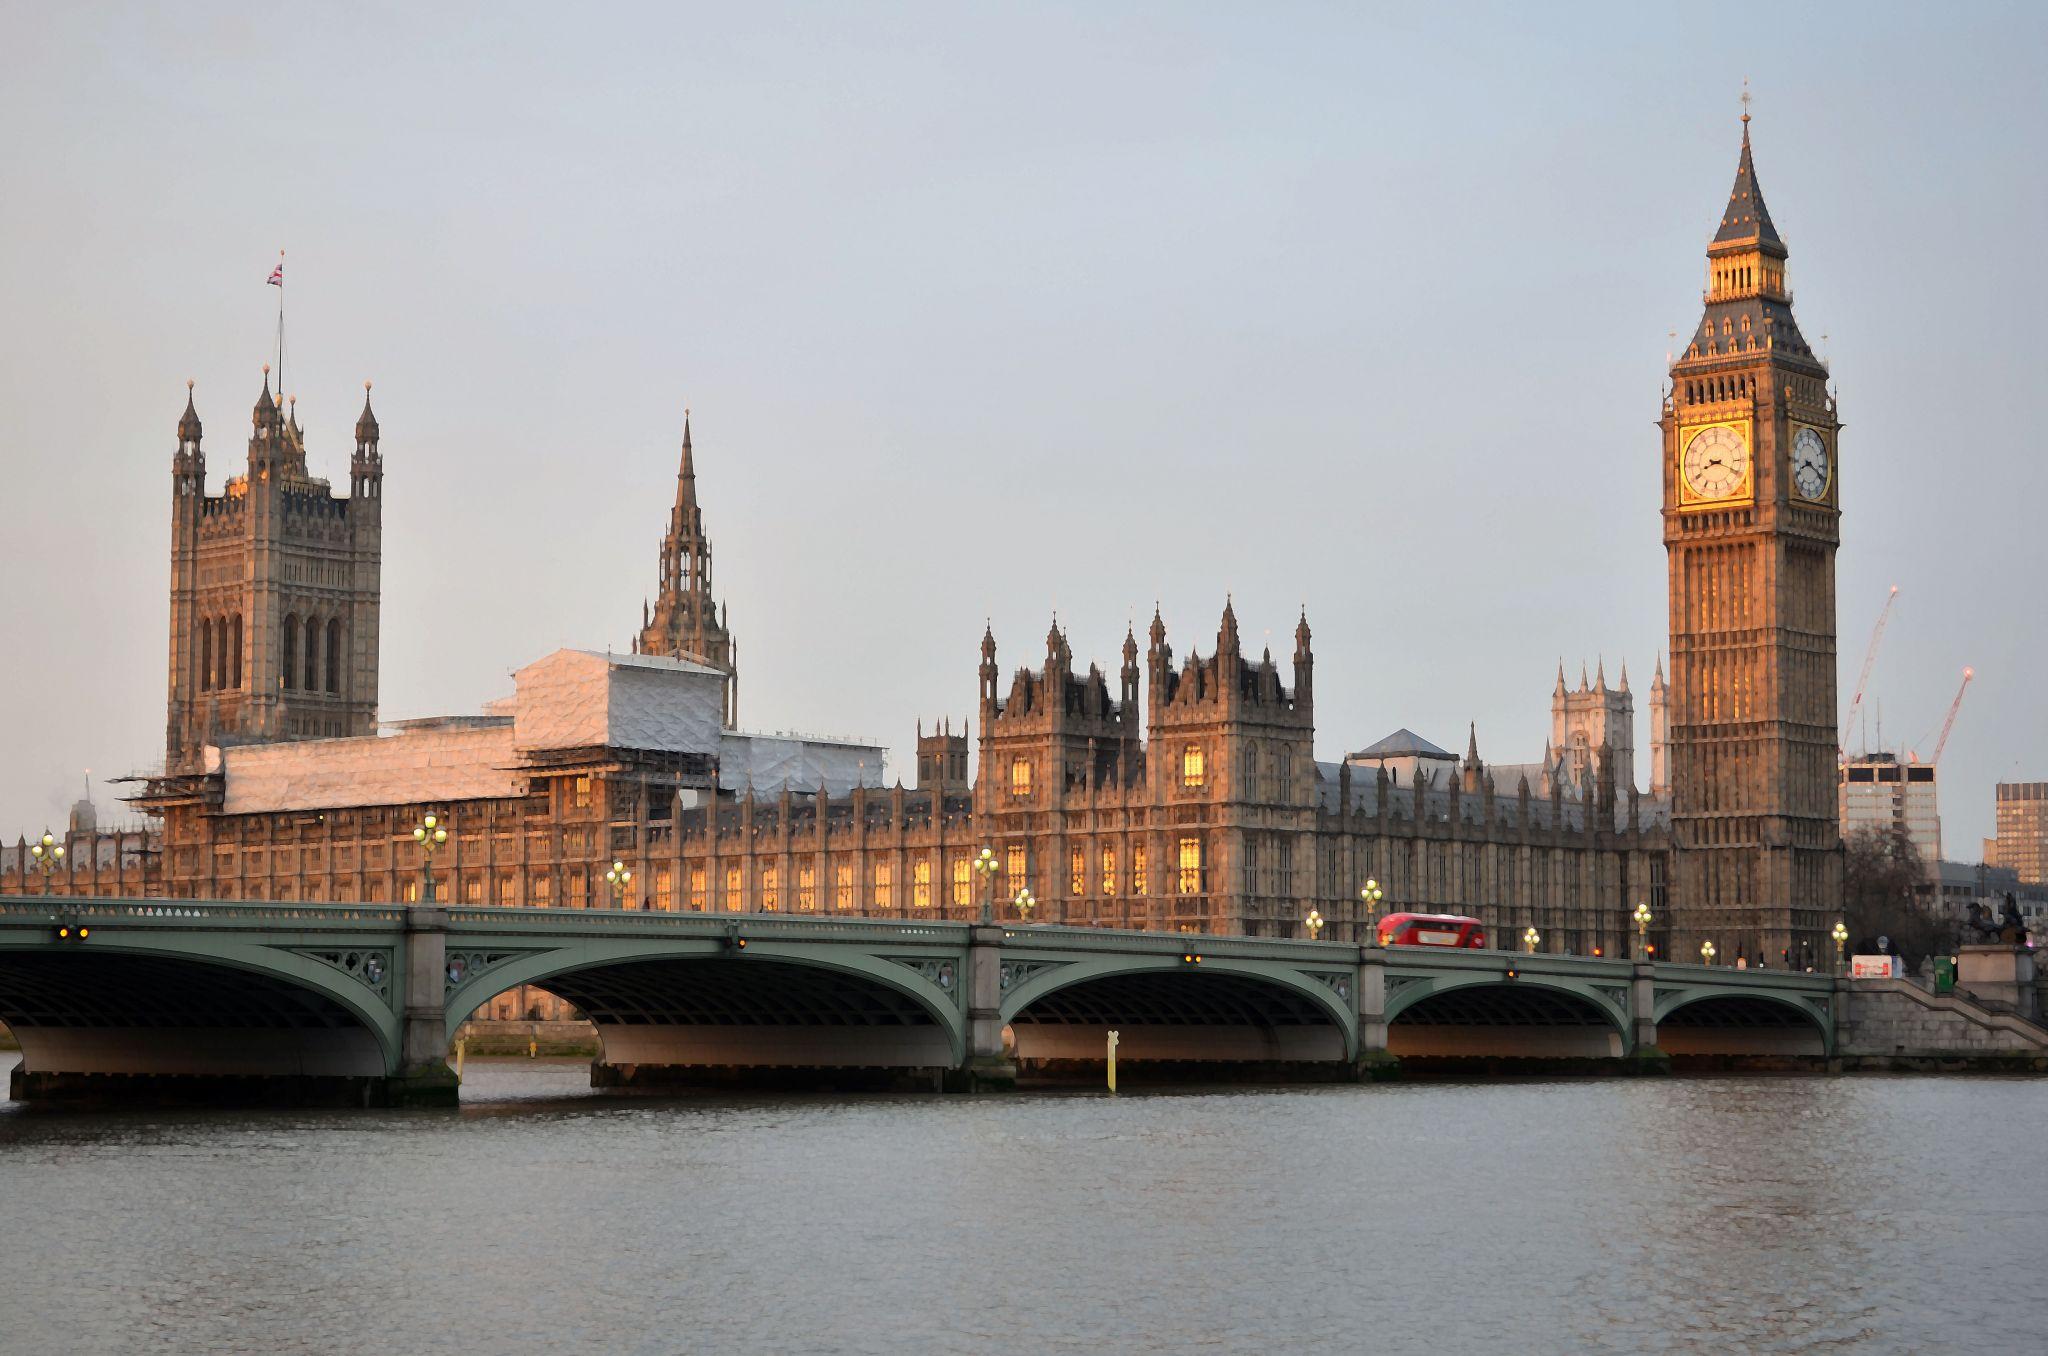 Westminster and St James, United Kingdom